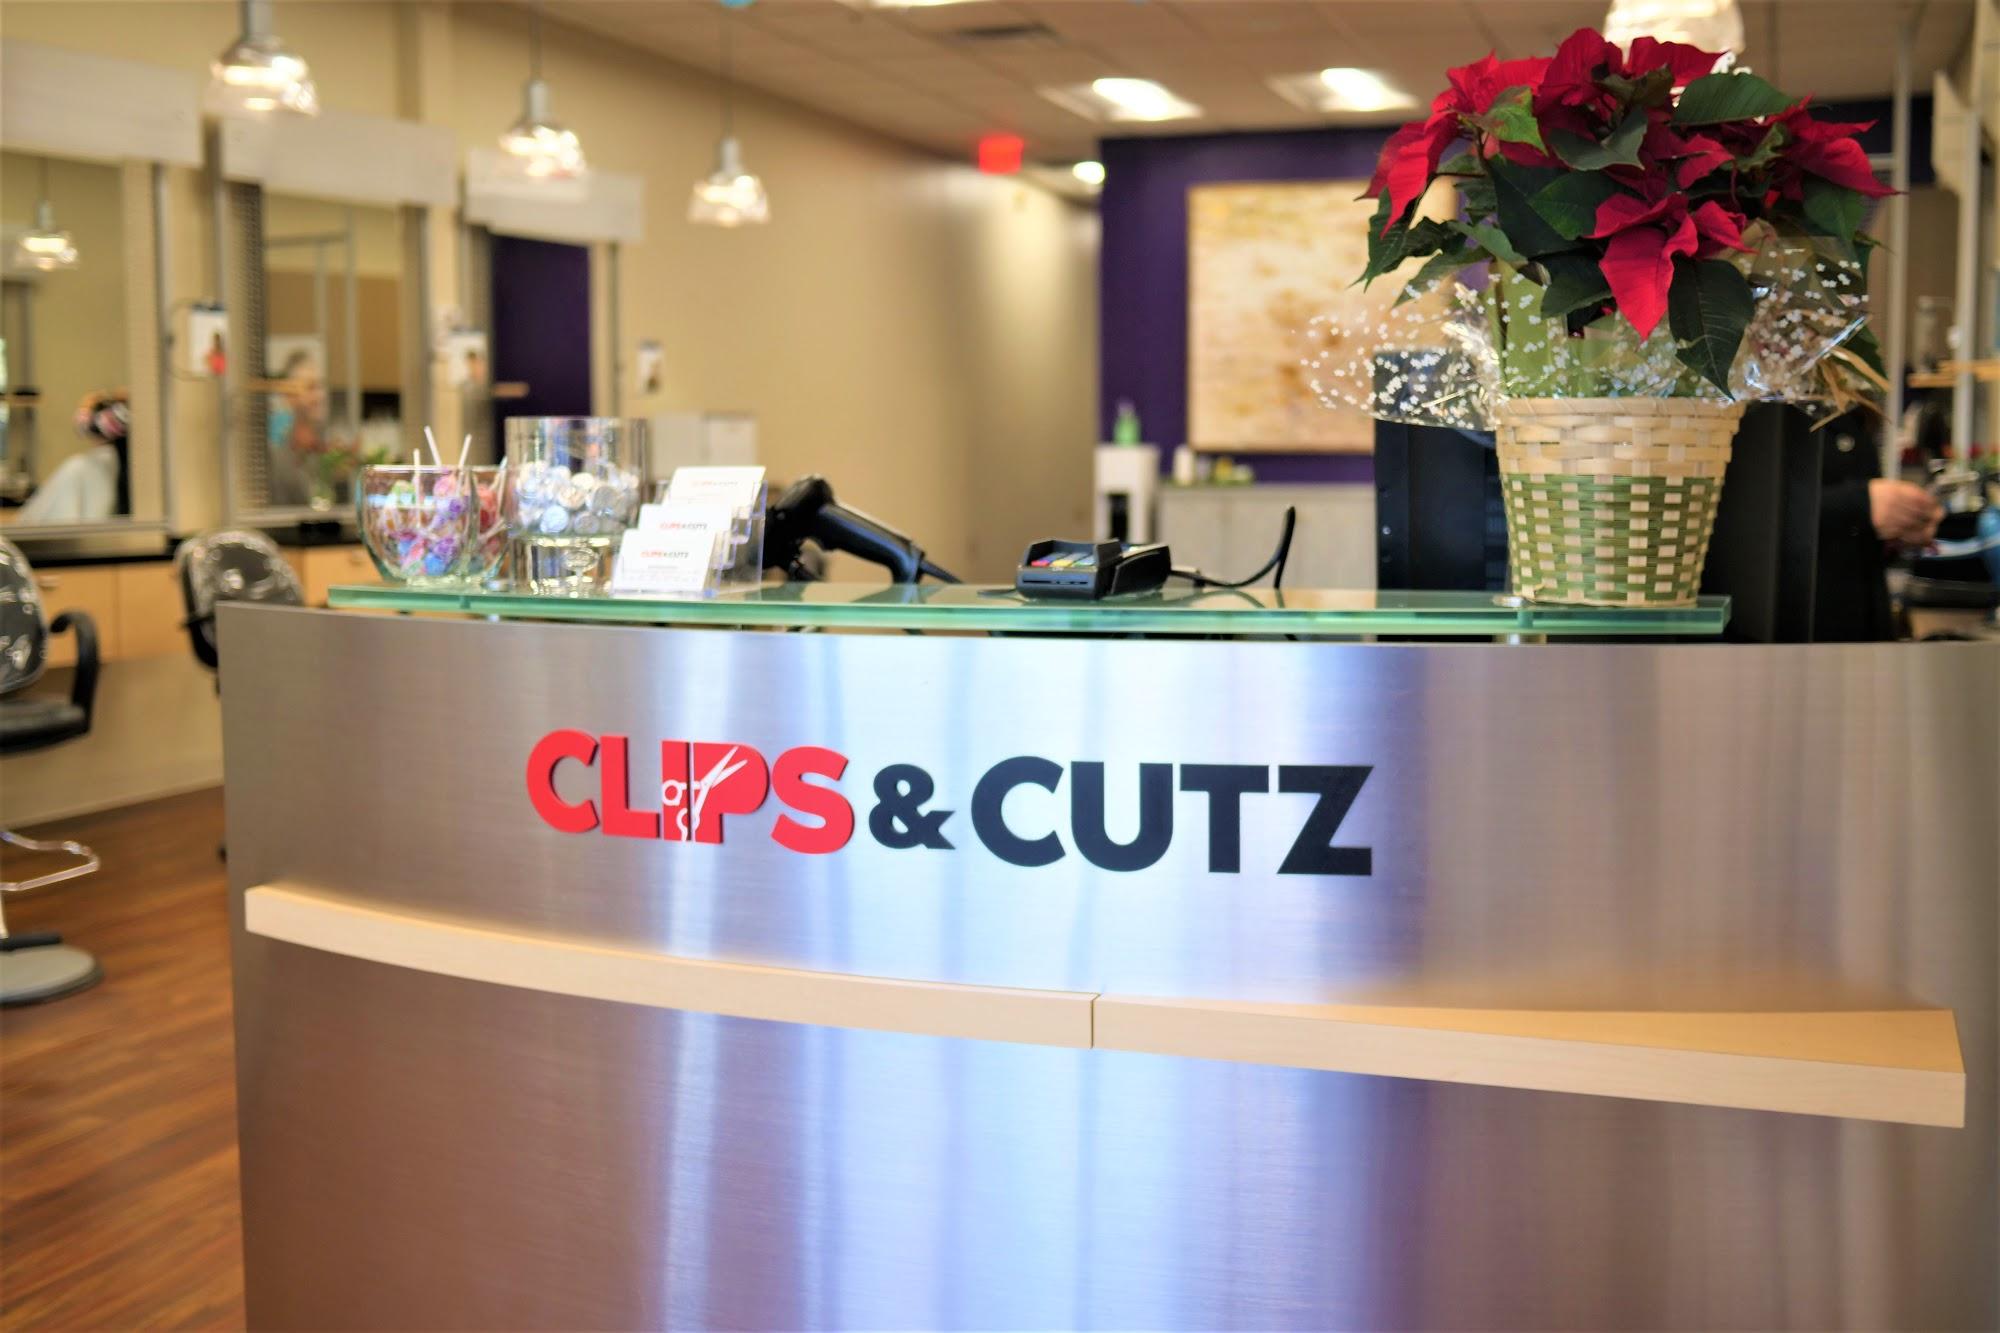 Clips & Cutz - Hair Salon 9210 Baltimore National Pike suite w-6, Ellicott City